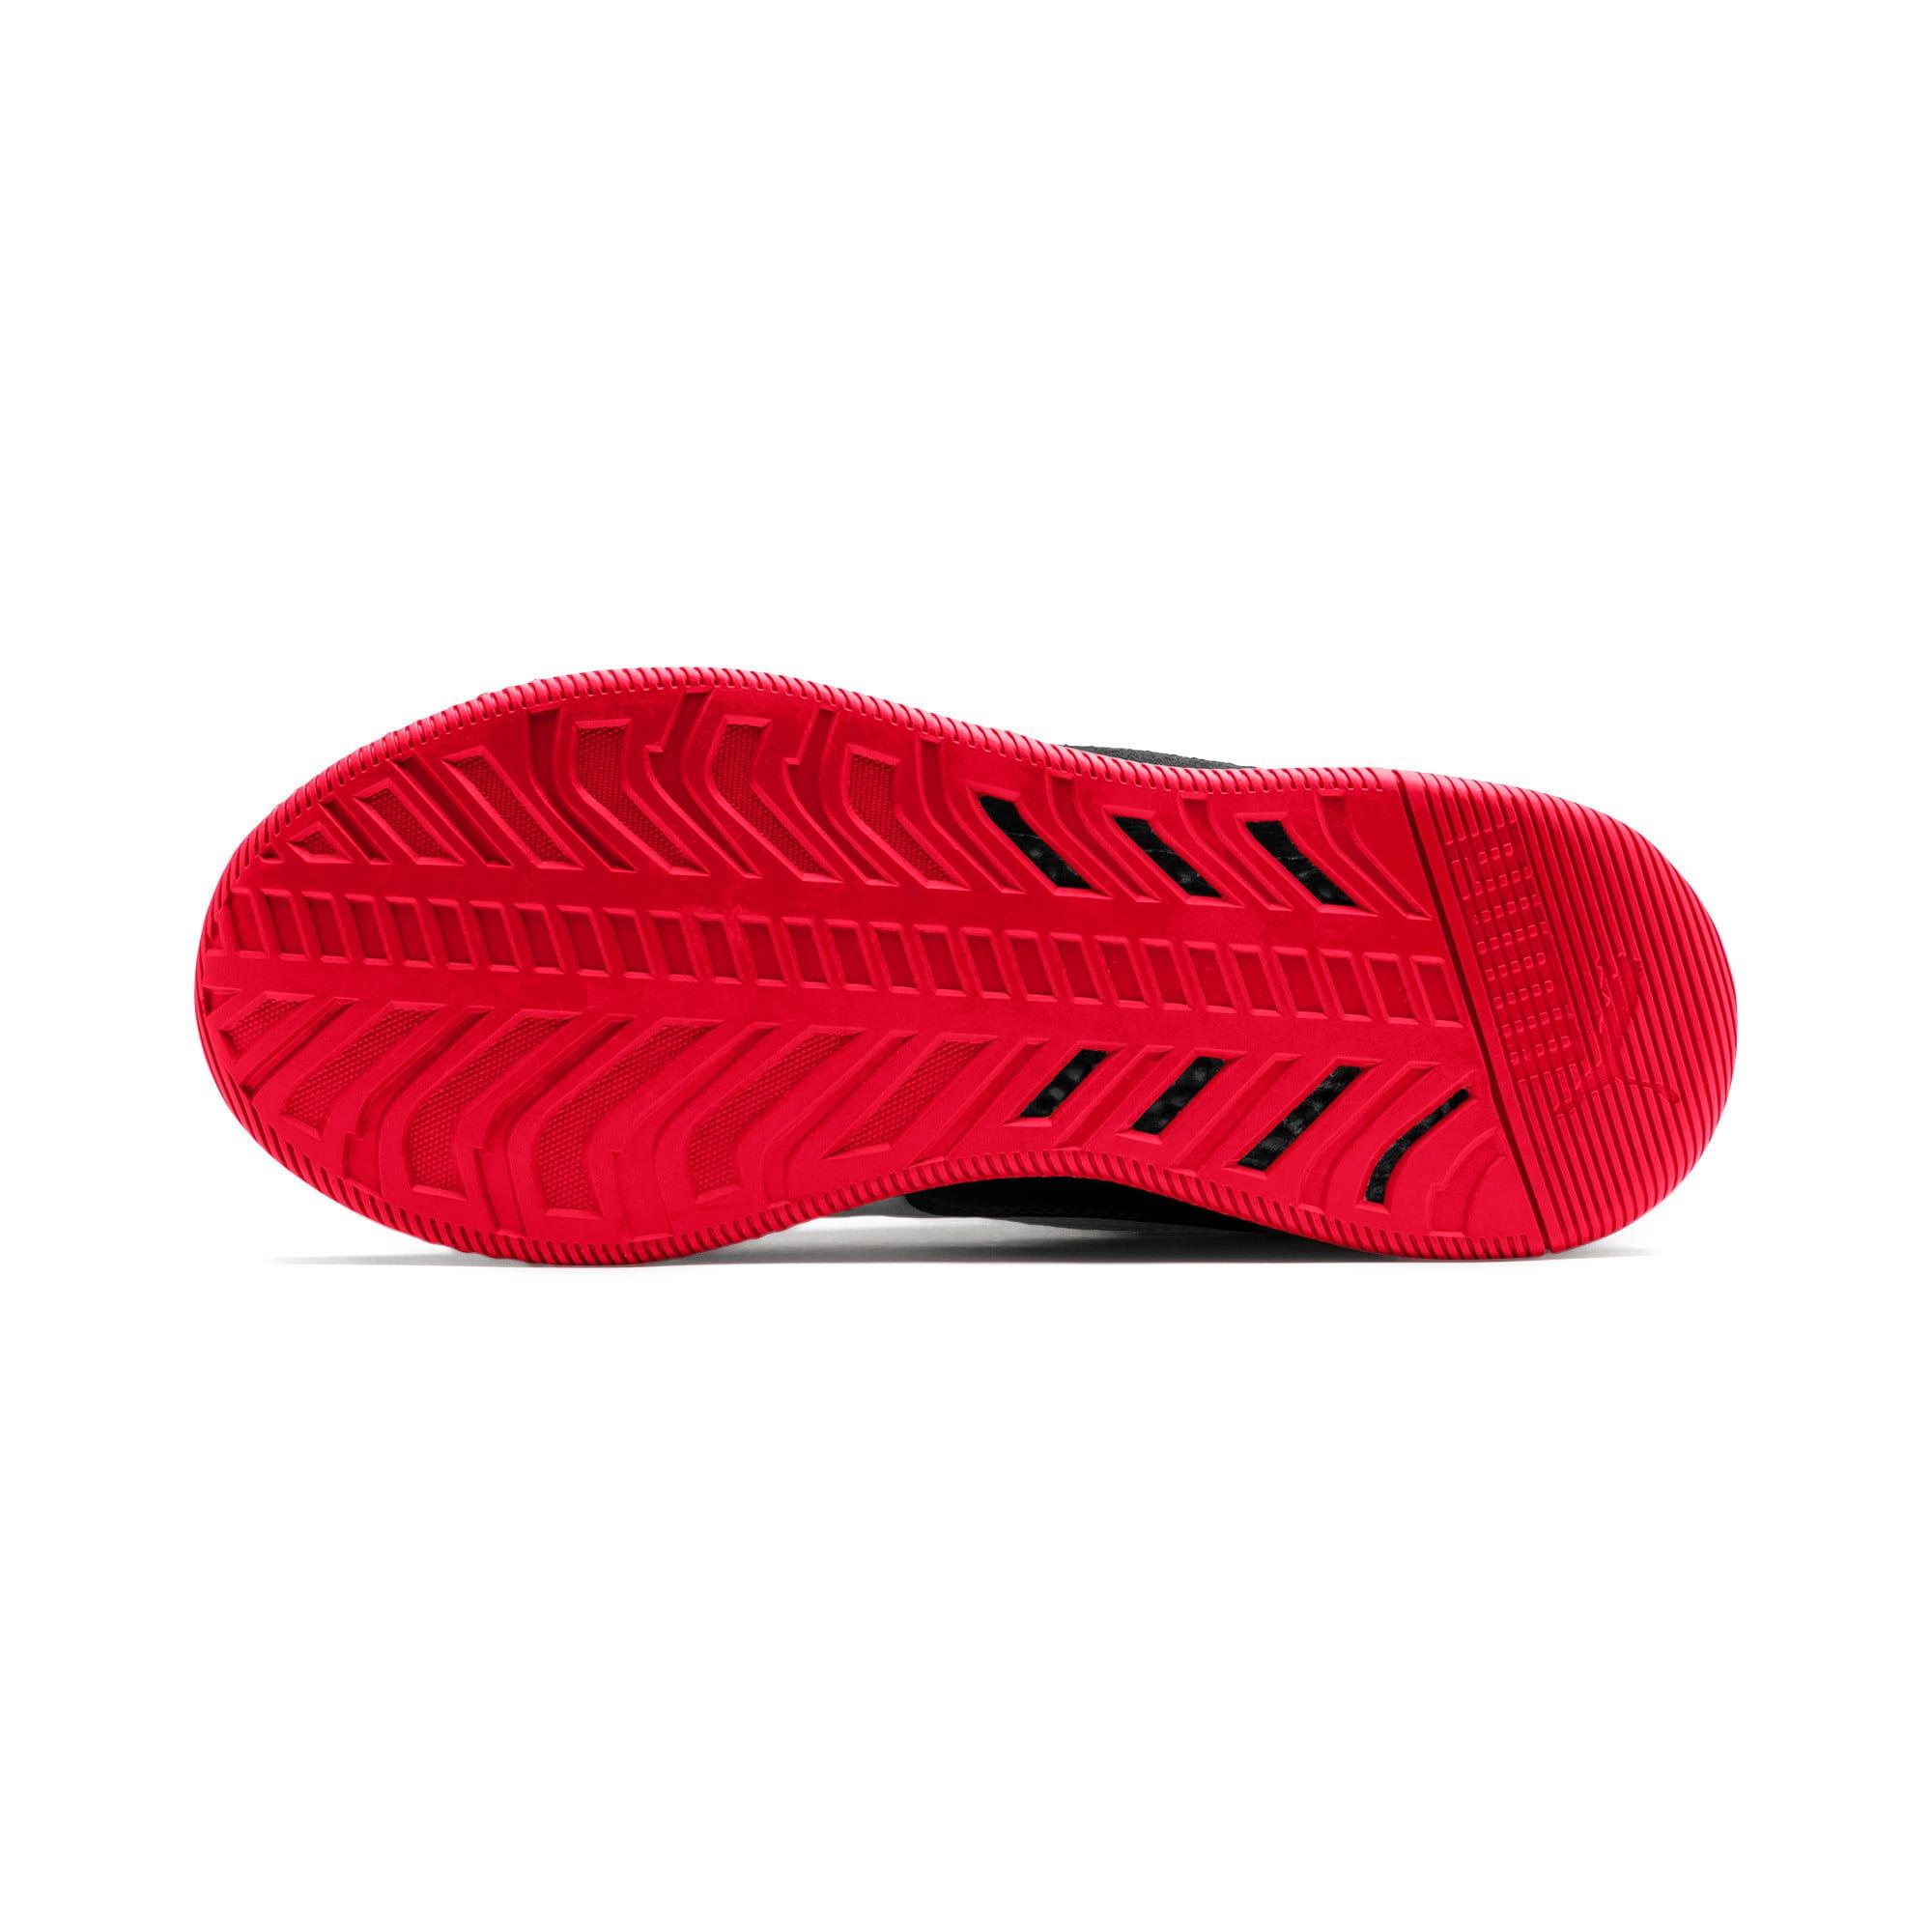 Thumbnail 5 of Ferrari Speed HYBRID LS Herren Sneaker, Blk-Pstl Prchmnt-Rosso Corsa, medium